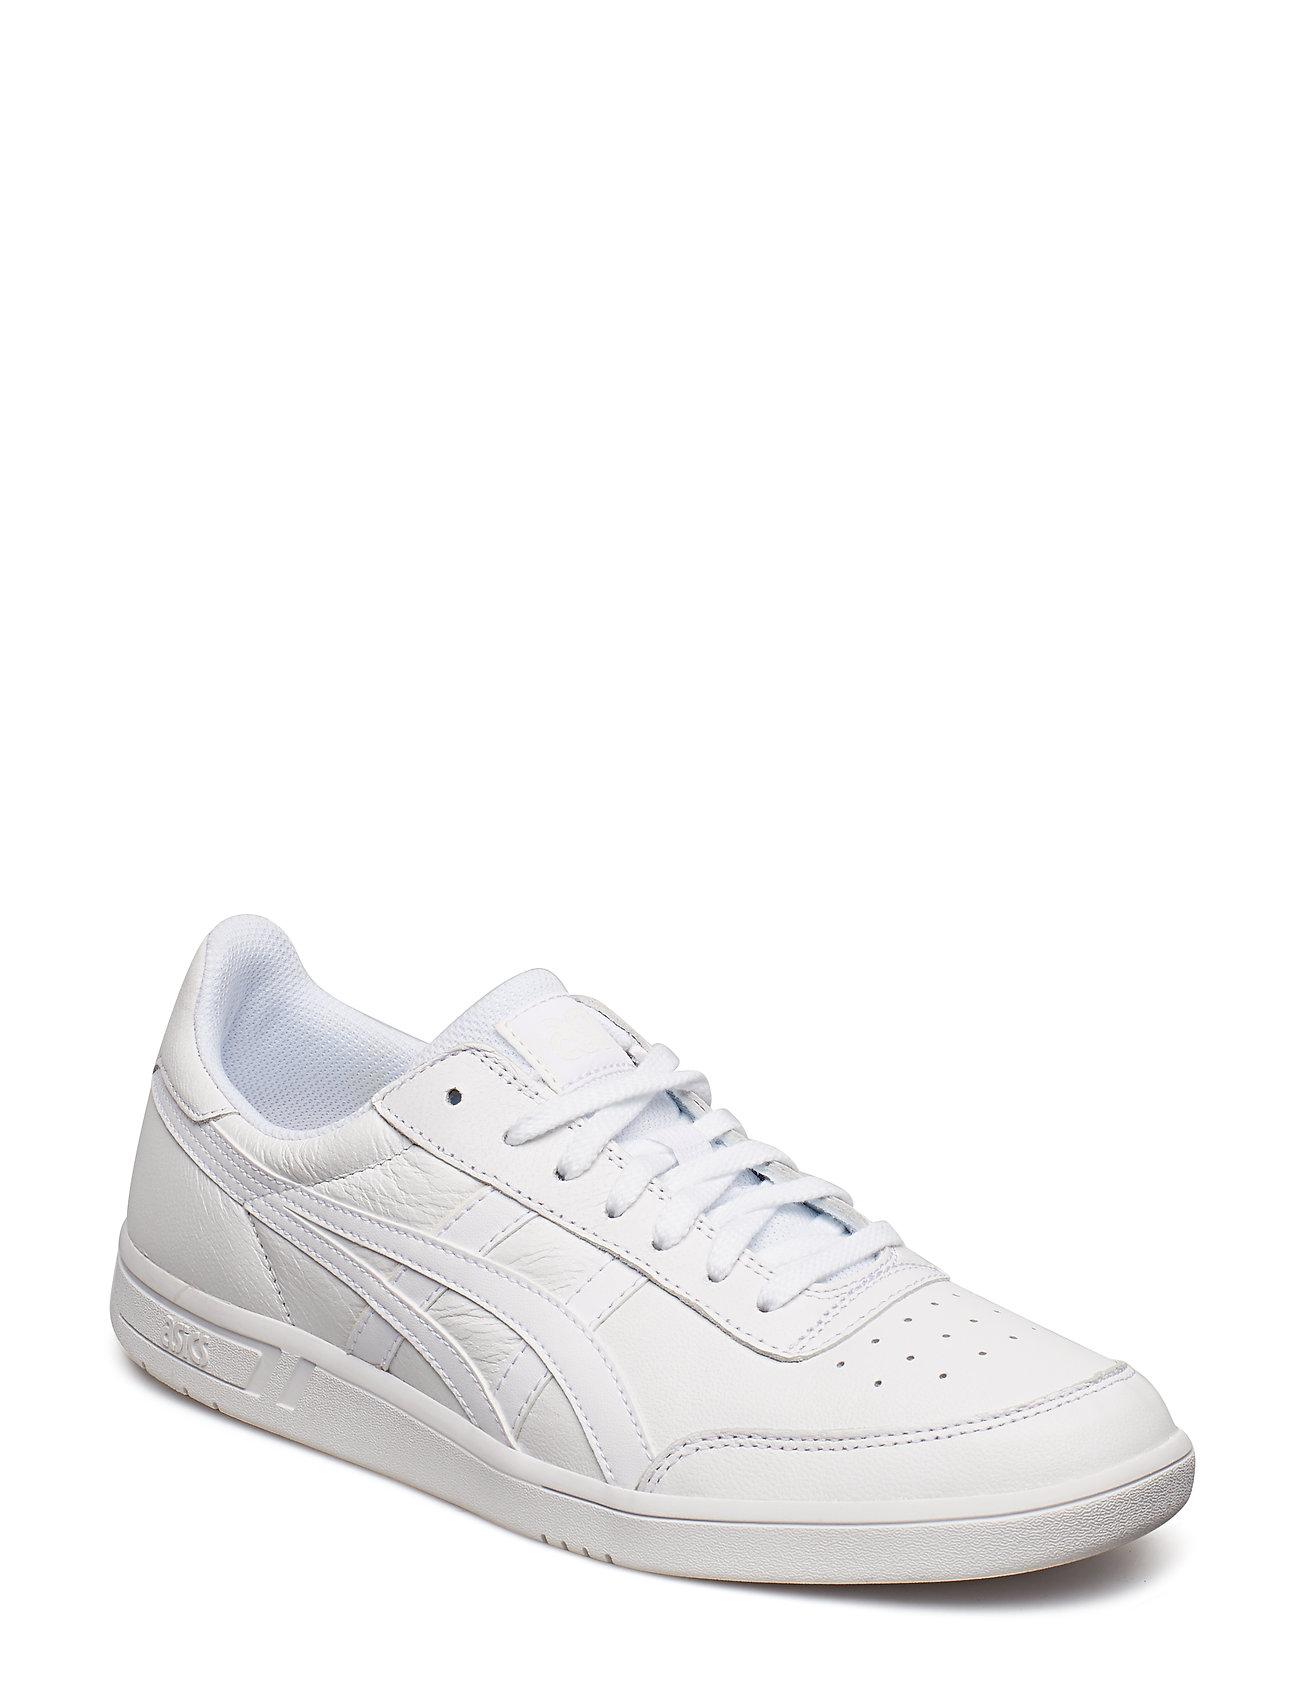 Image of Gel-Vickka Trs Shoes Sport Shoes Low-top Sneakers Hvid Asics (3129168161)